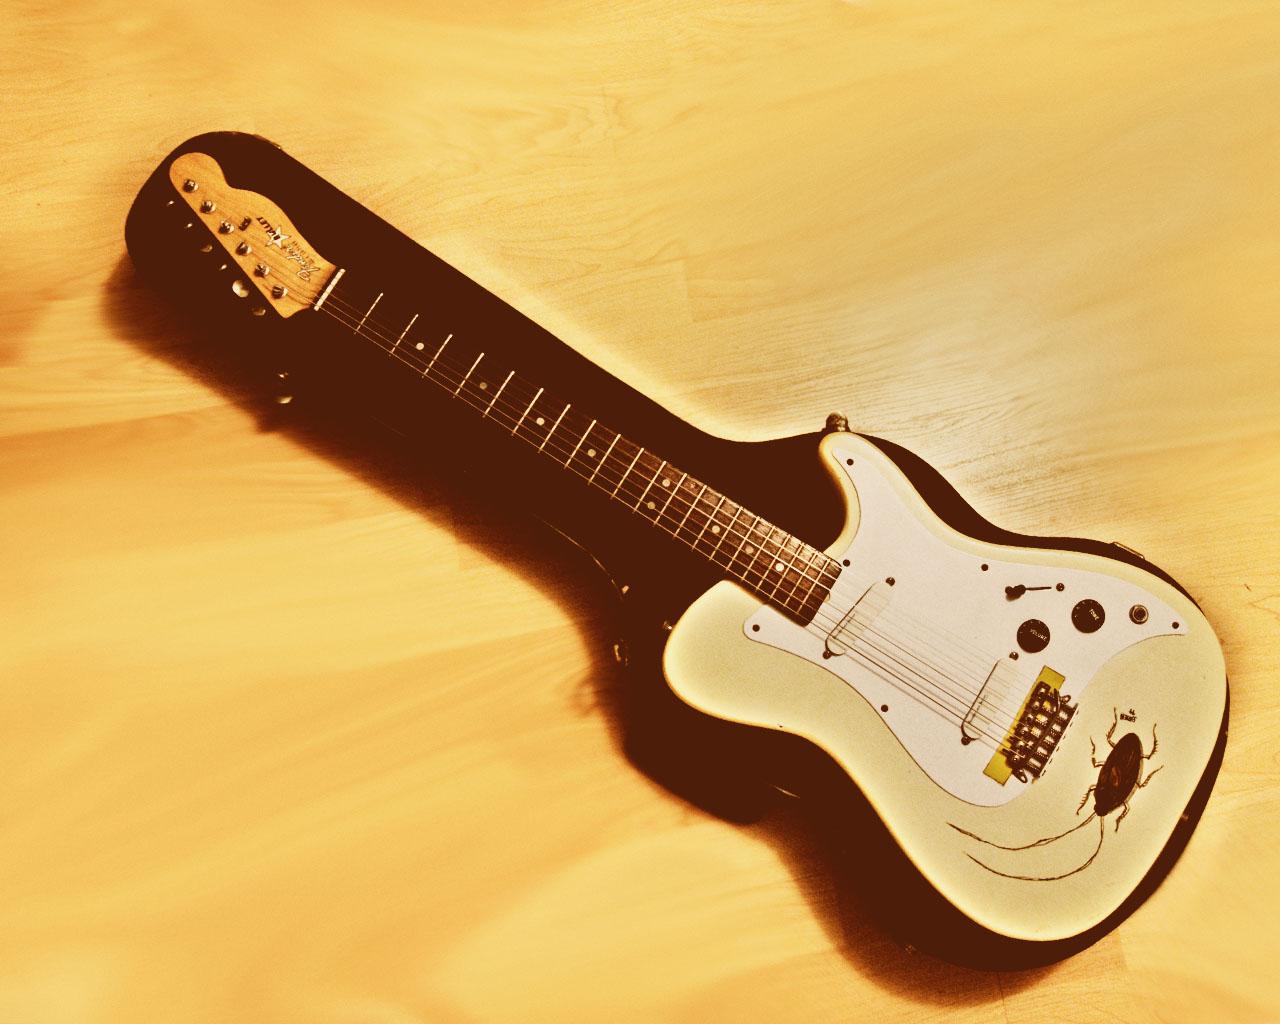 Fender Guitar Wallpapers For Desktop 2106 Hd Wallpapers in Music 1280x1024